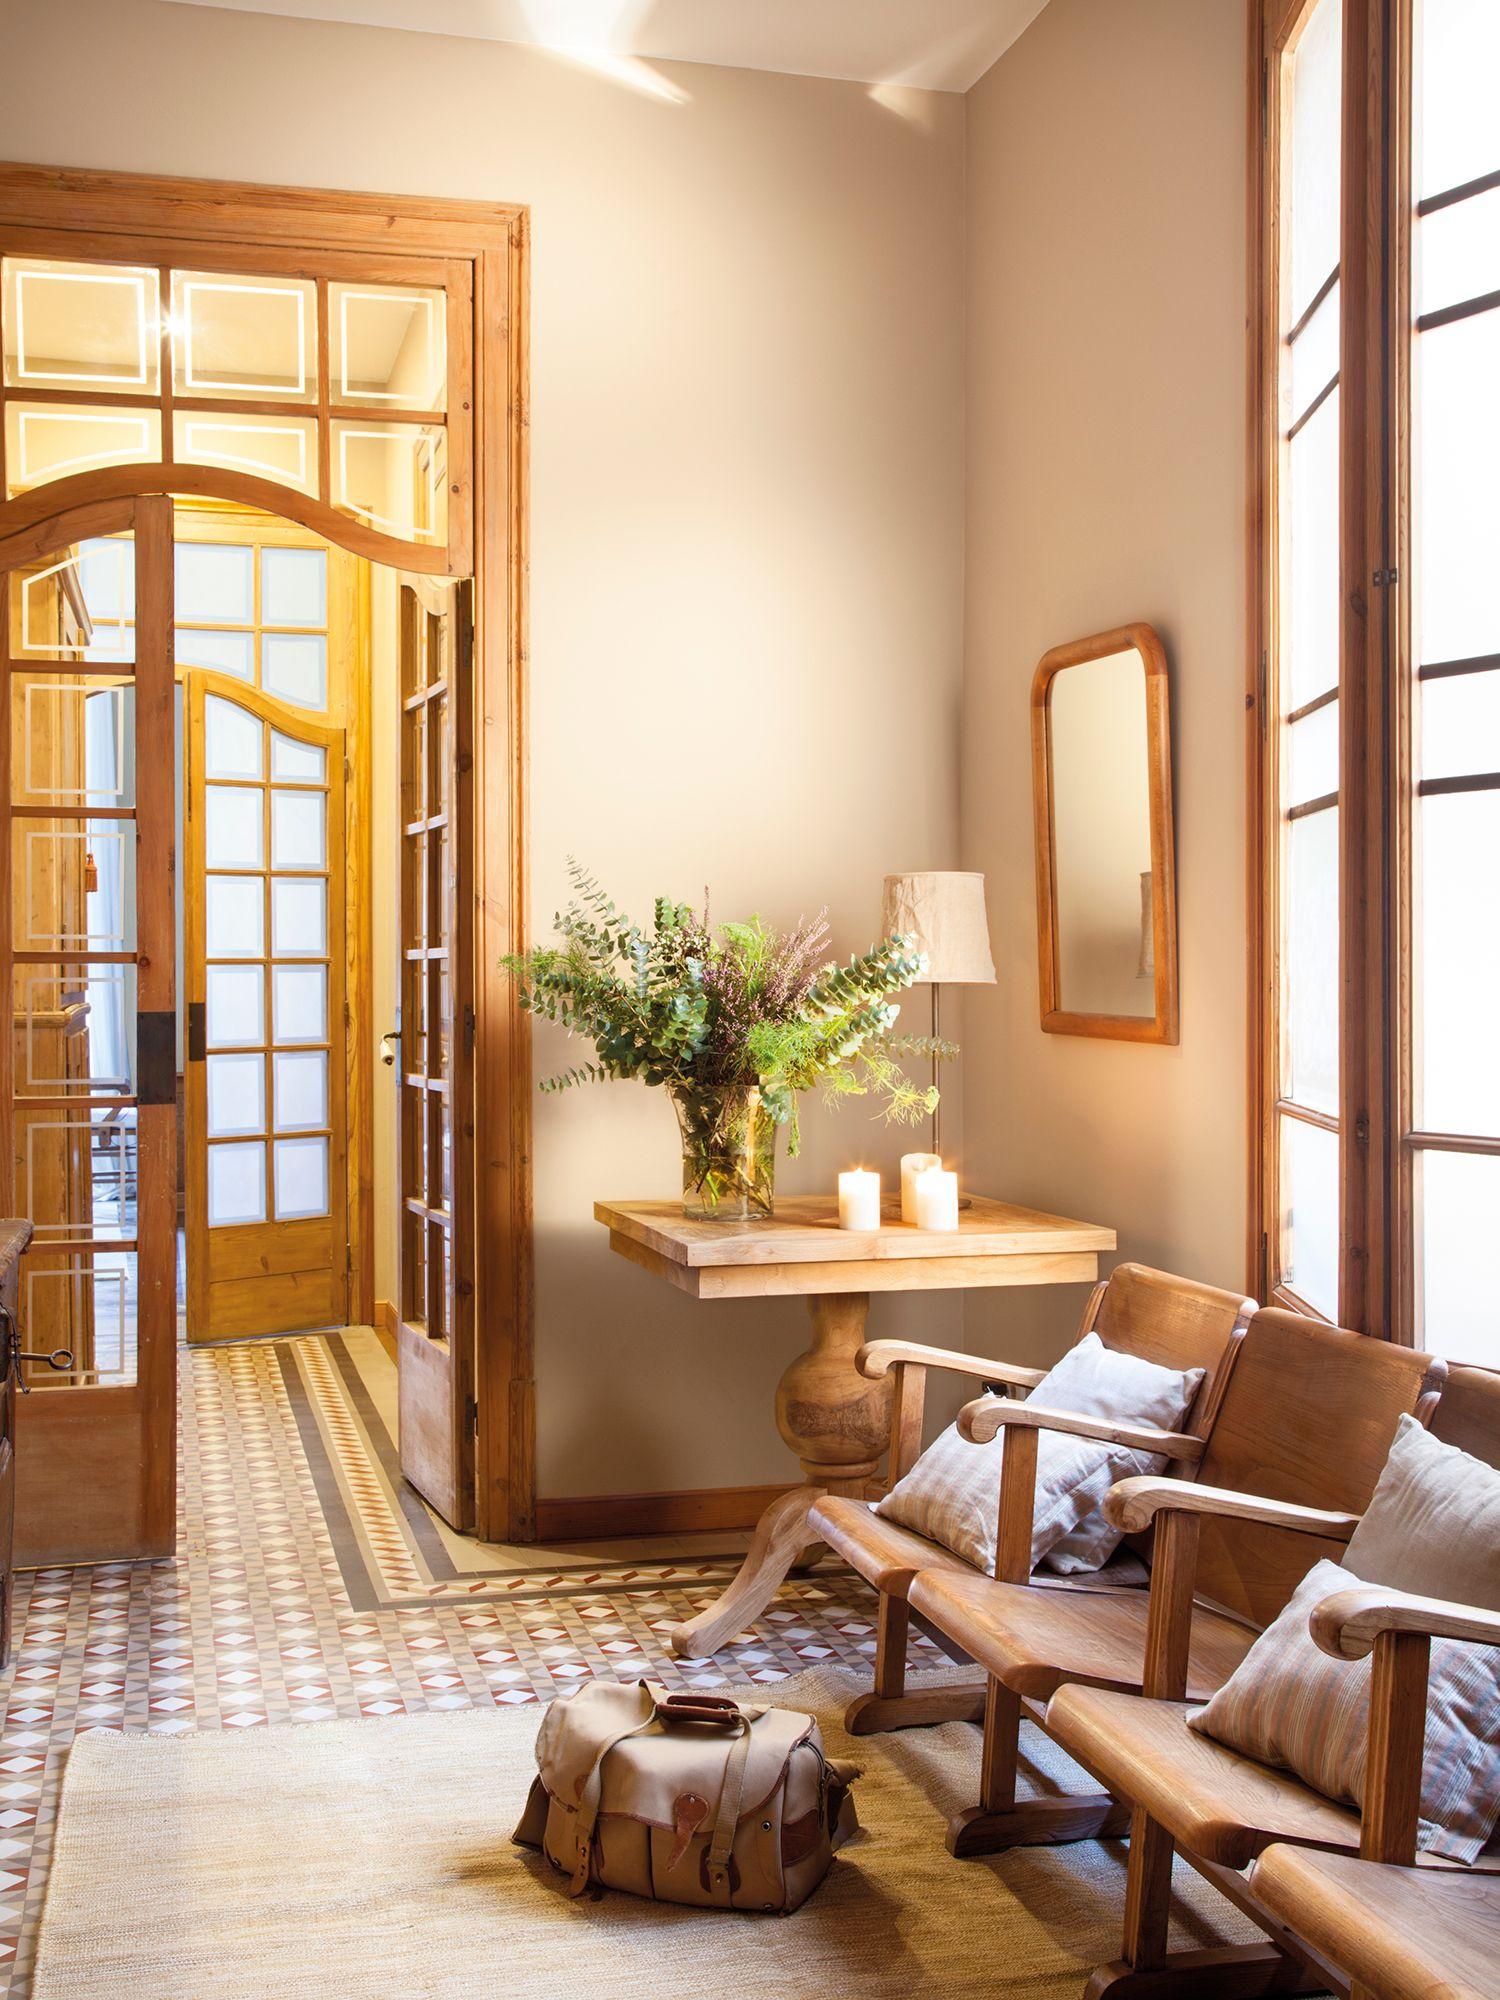 Recibidor cl sico con puerta de madera acristalada - Recibidores clasicos ...